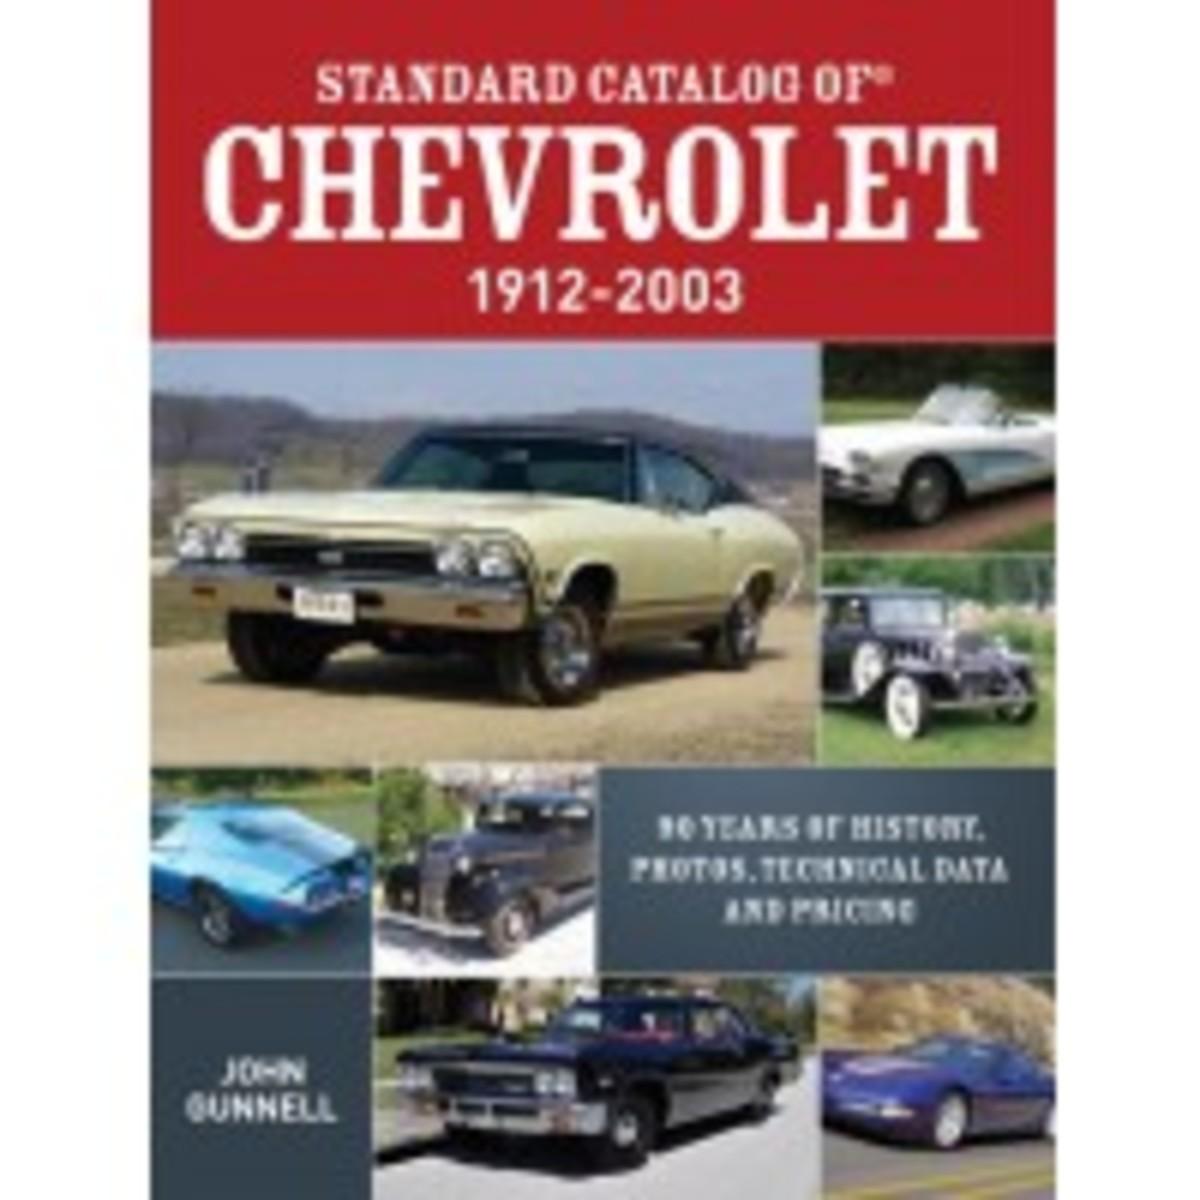 The Standard Catalog of Chevrolet